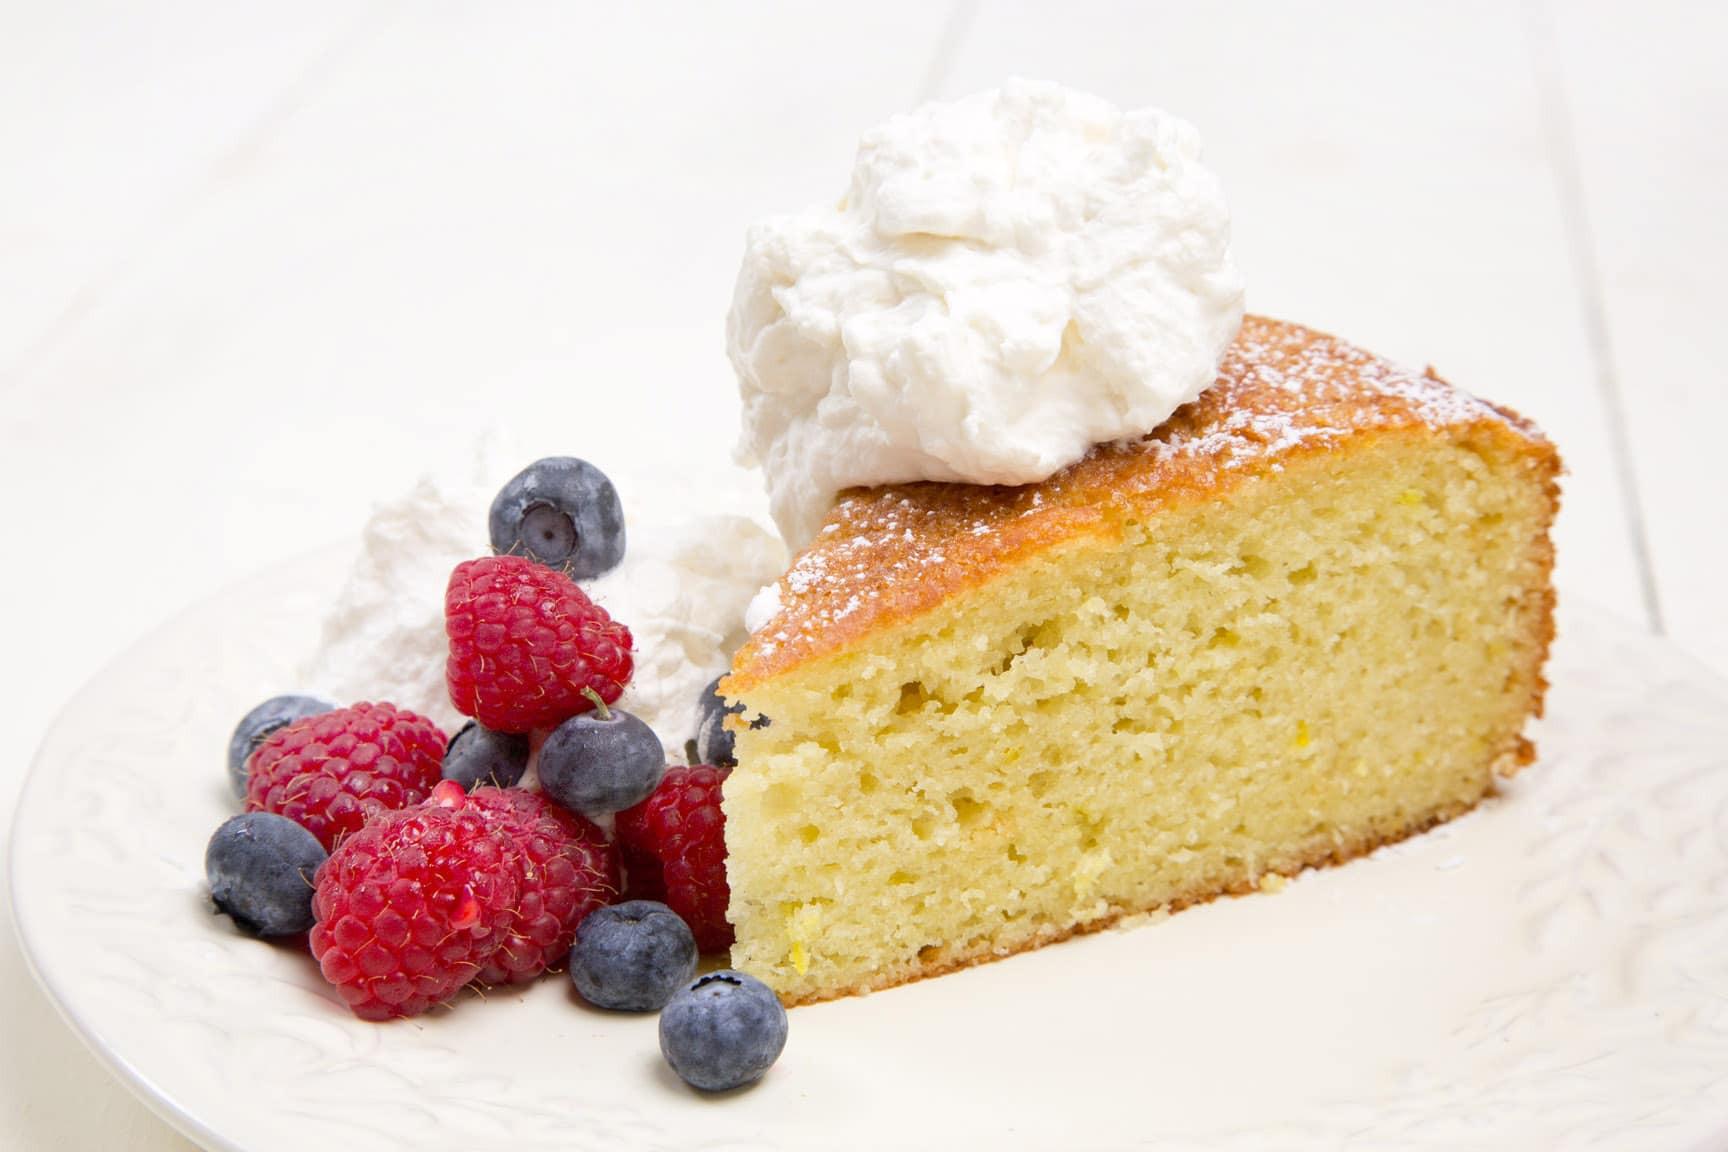 Yogurt Cake Recipe  Orange Yogurt Cake Recipe perfect for breakfast or dessert